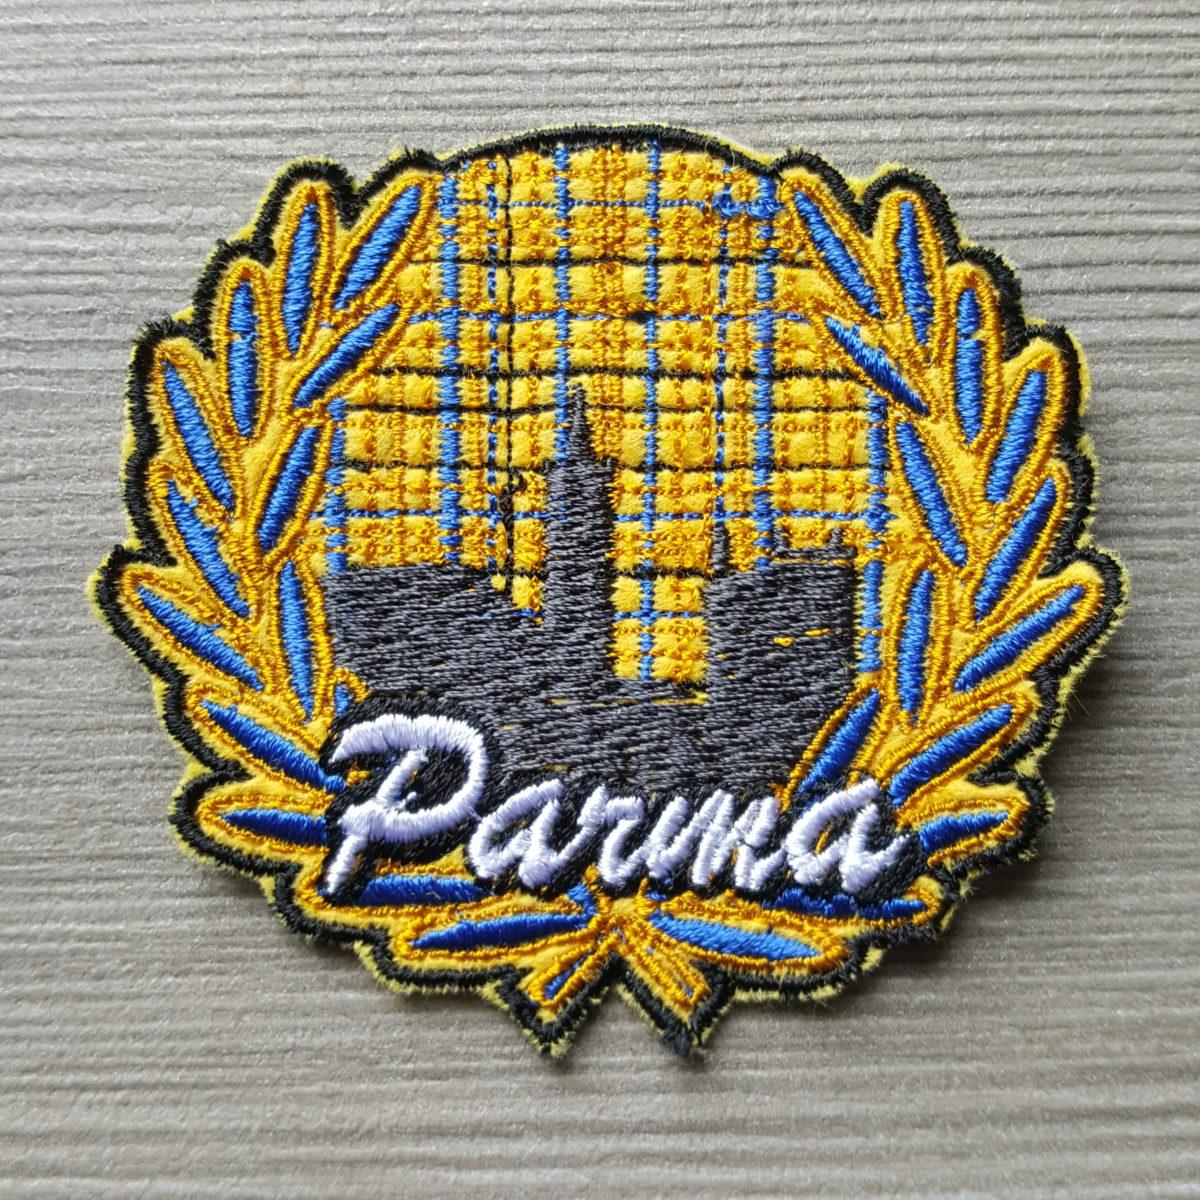 Toppa Ricamata PARMA Boys 1977